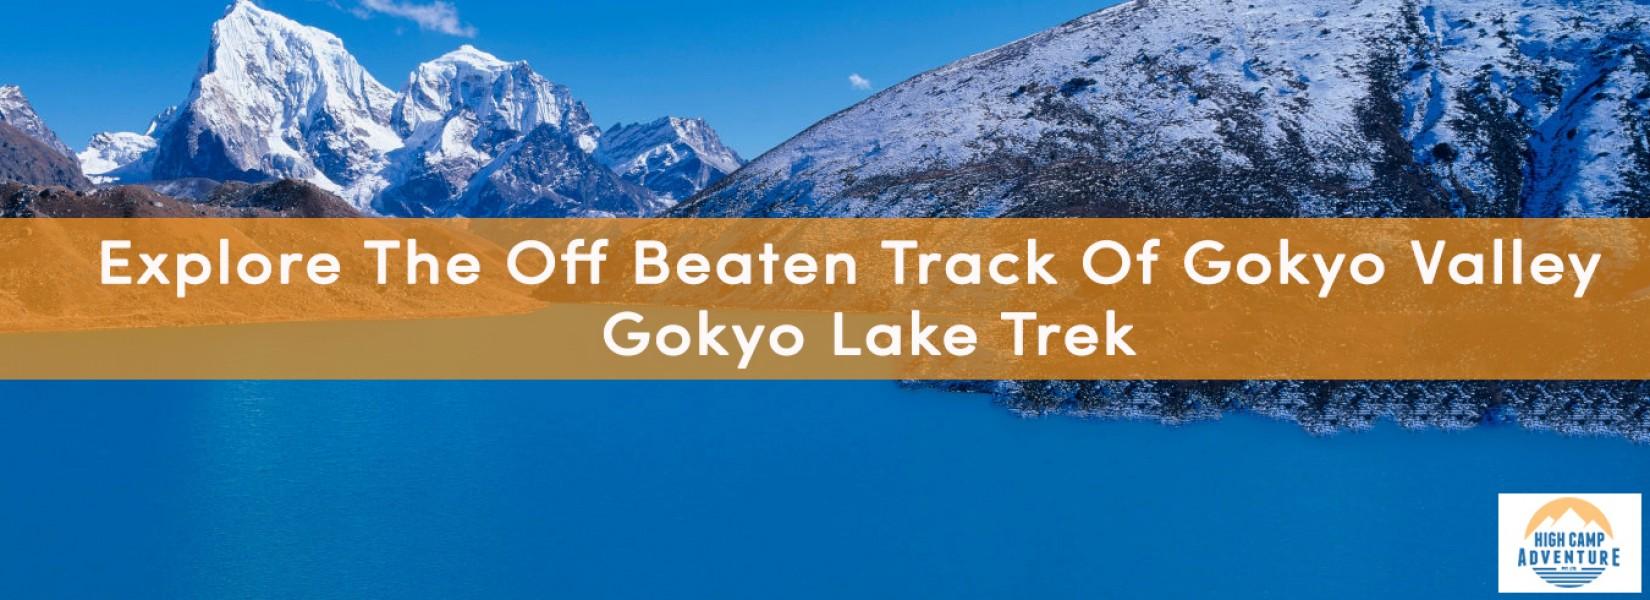 gokyo lake trek